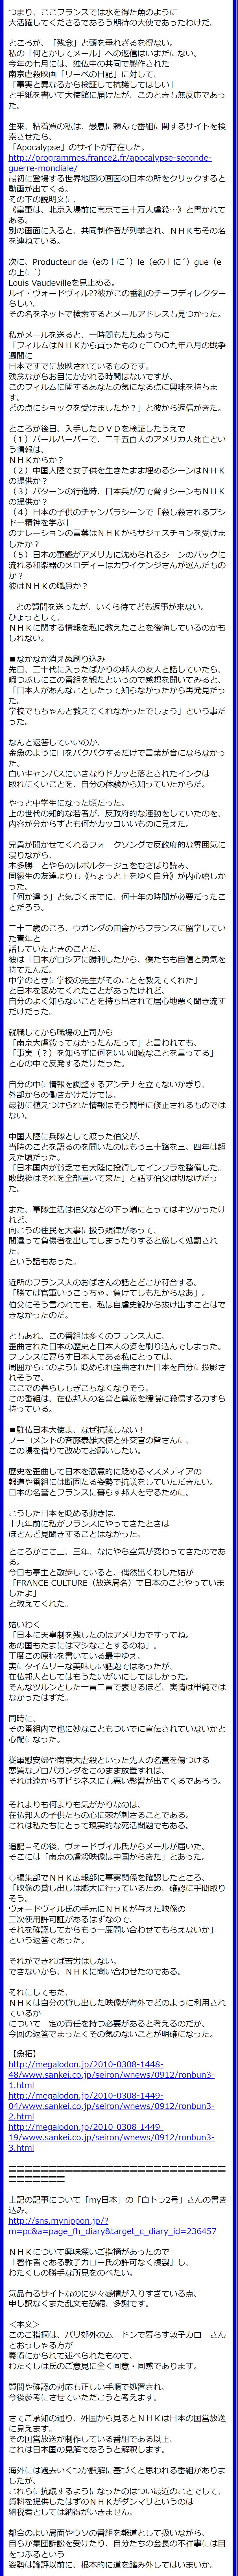 NHKが関与した恐るべき「黙示録」1_2